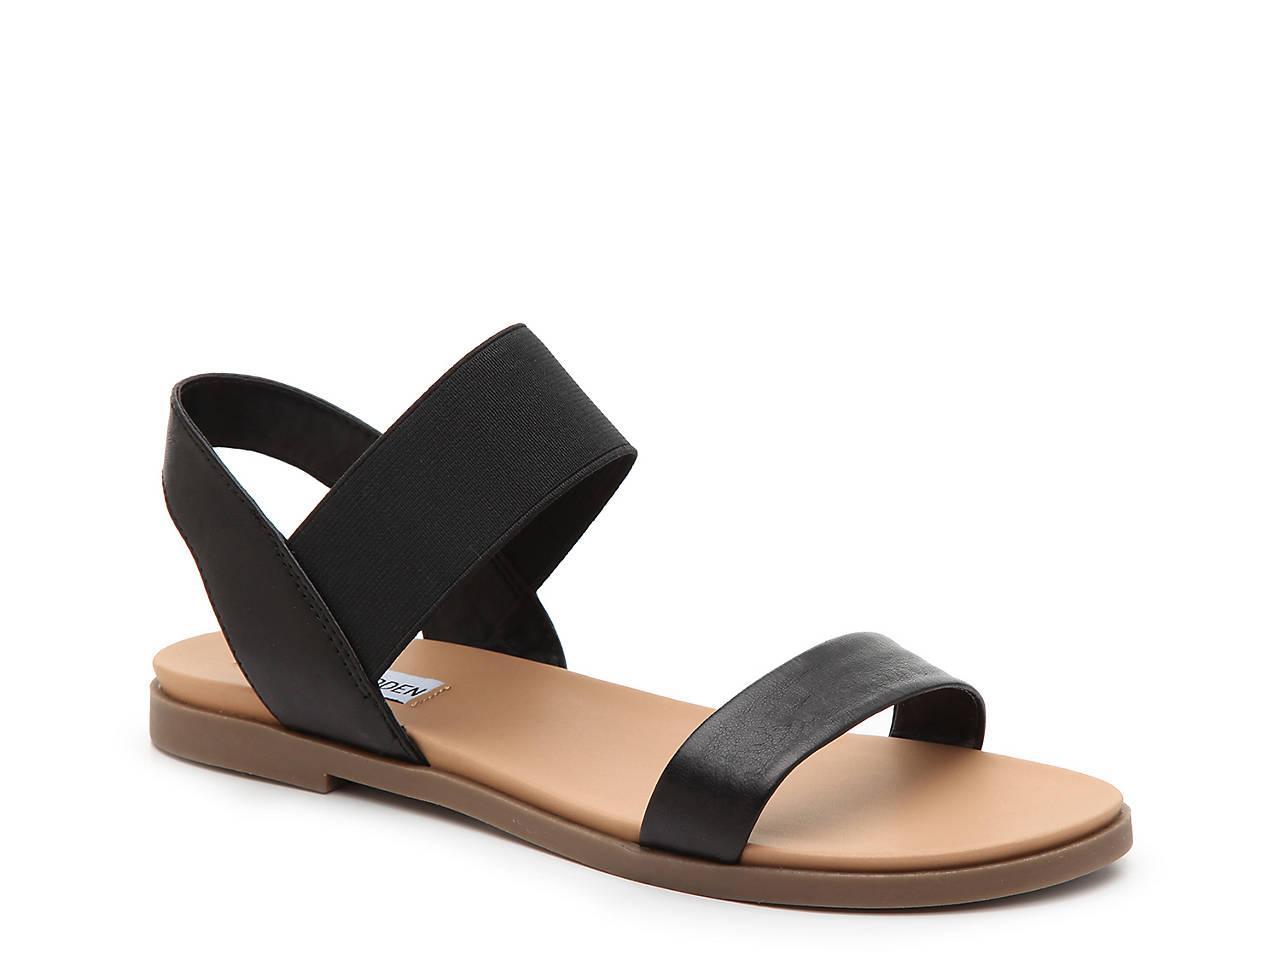 1de78996747 Steve Madden Darnell Flat Sandal Women s Shoes